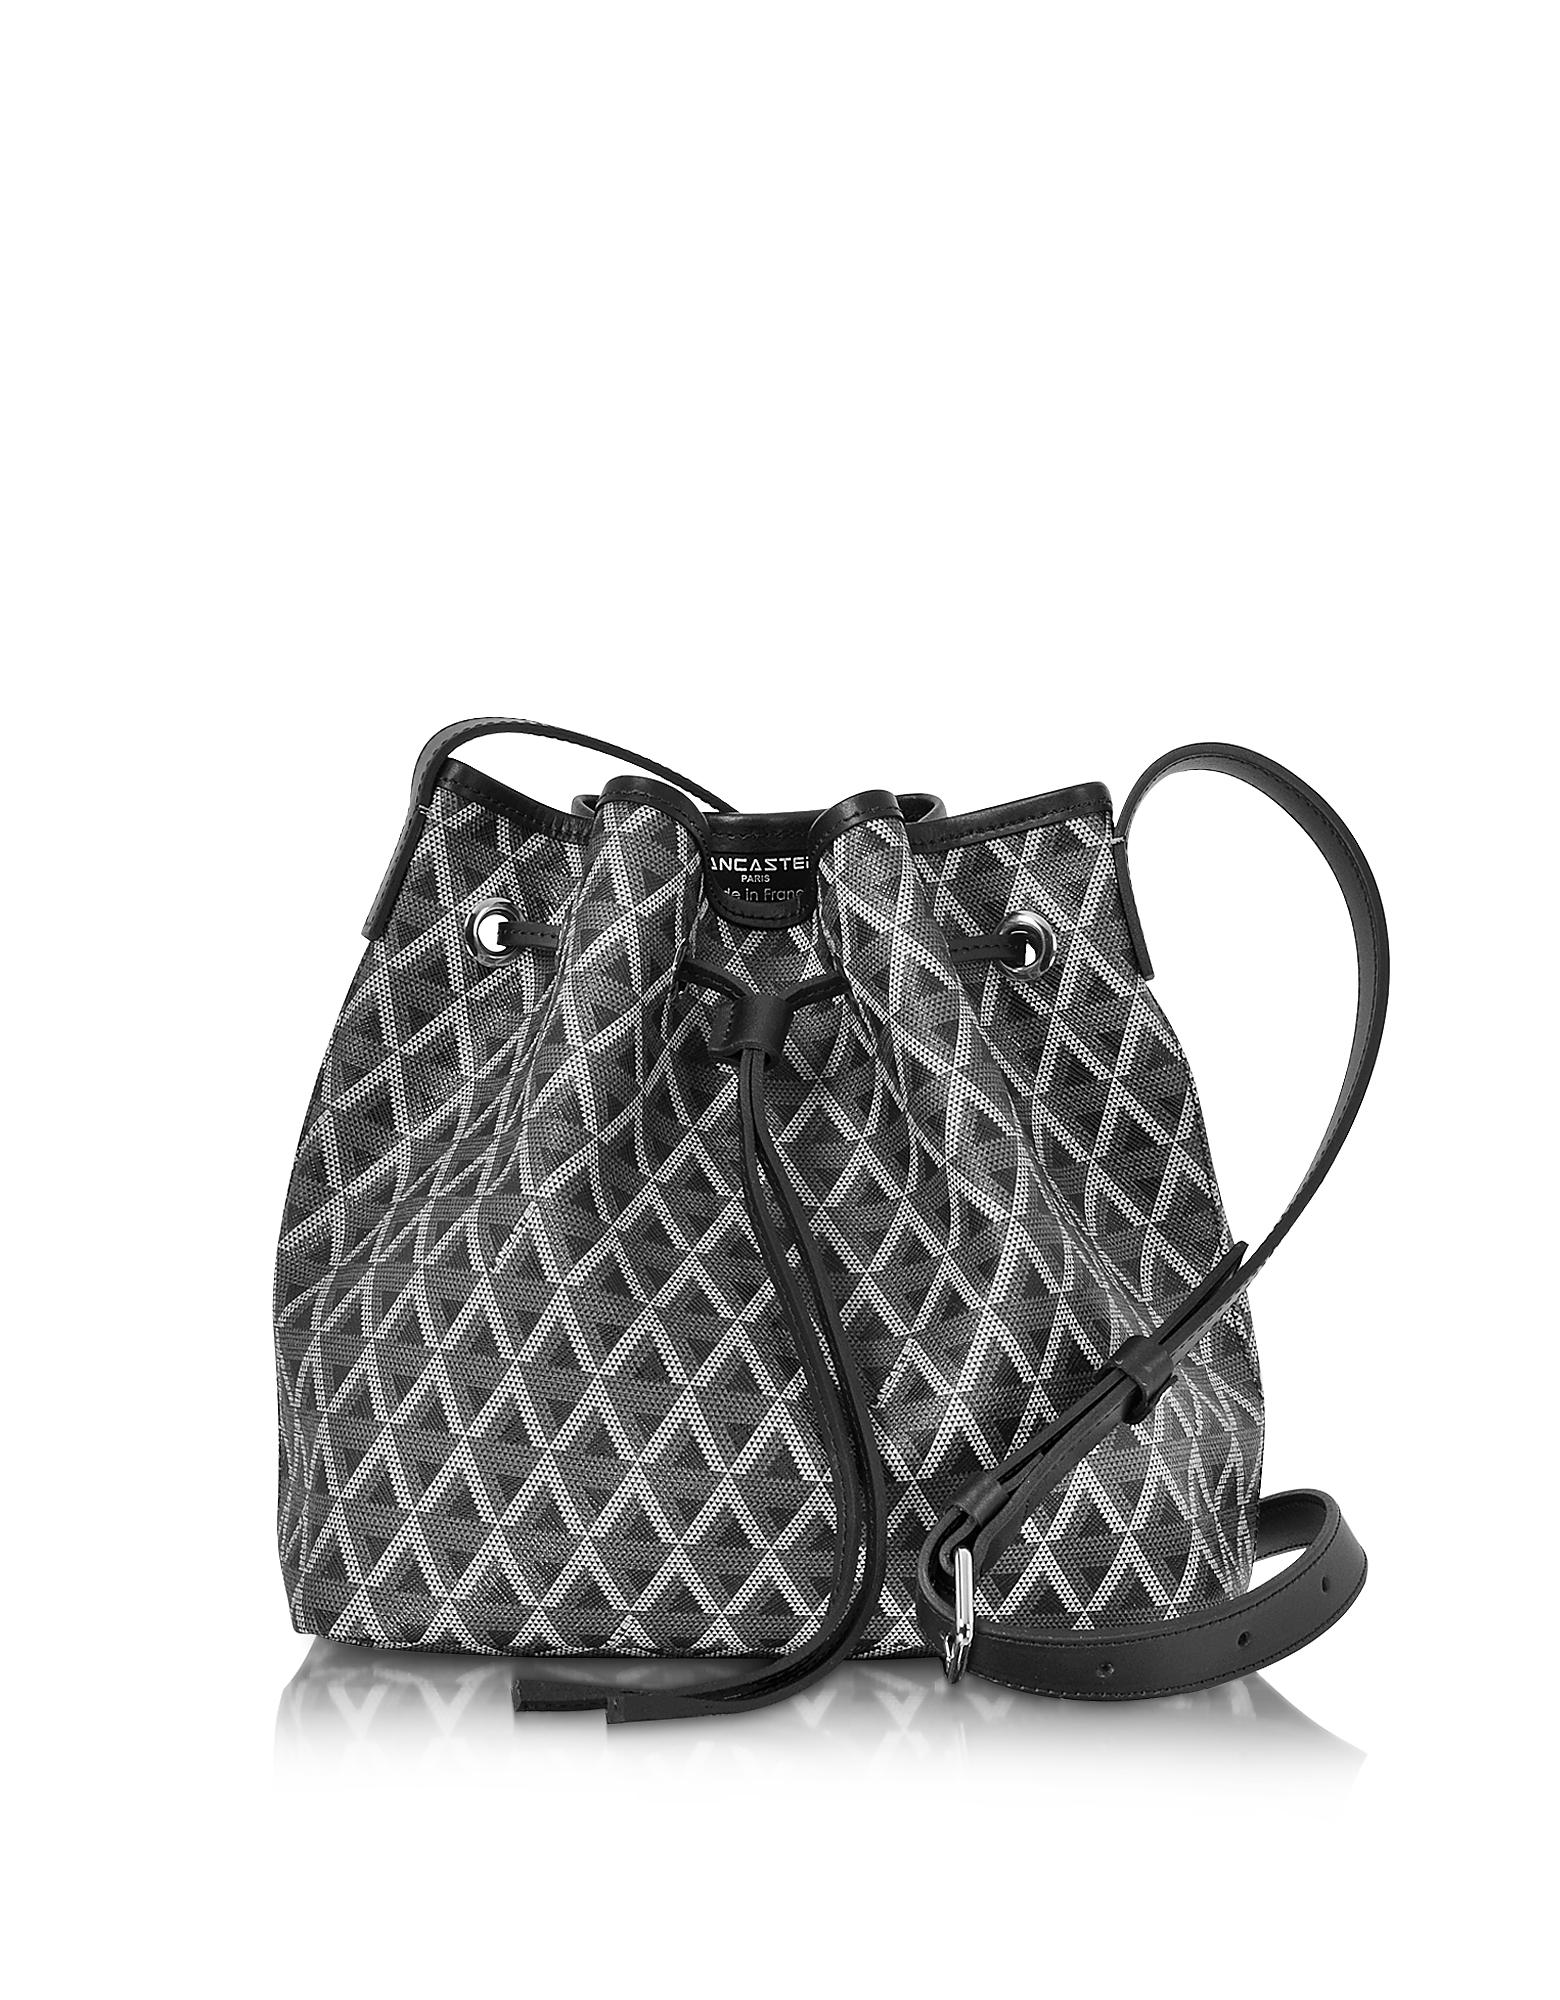 Lancaster Paris Handbags, Ikon Small Coated Canvas Bucket Bag